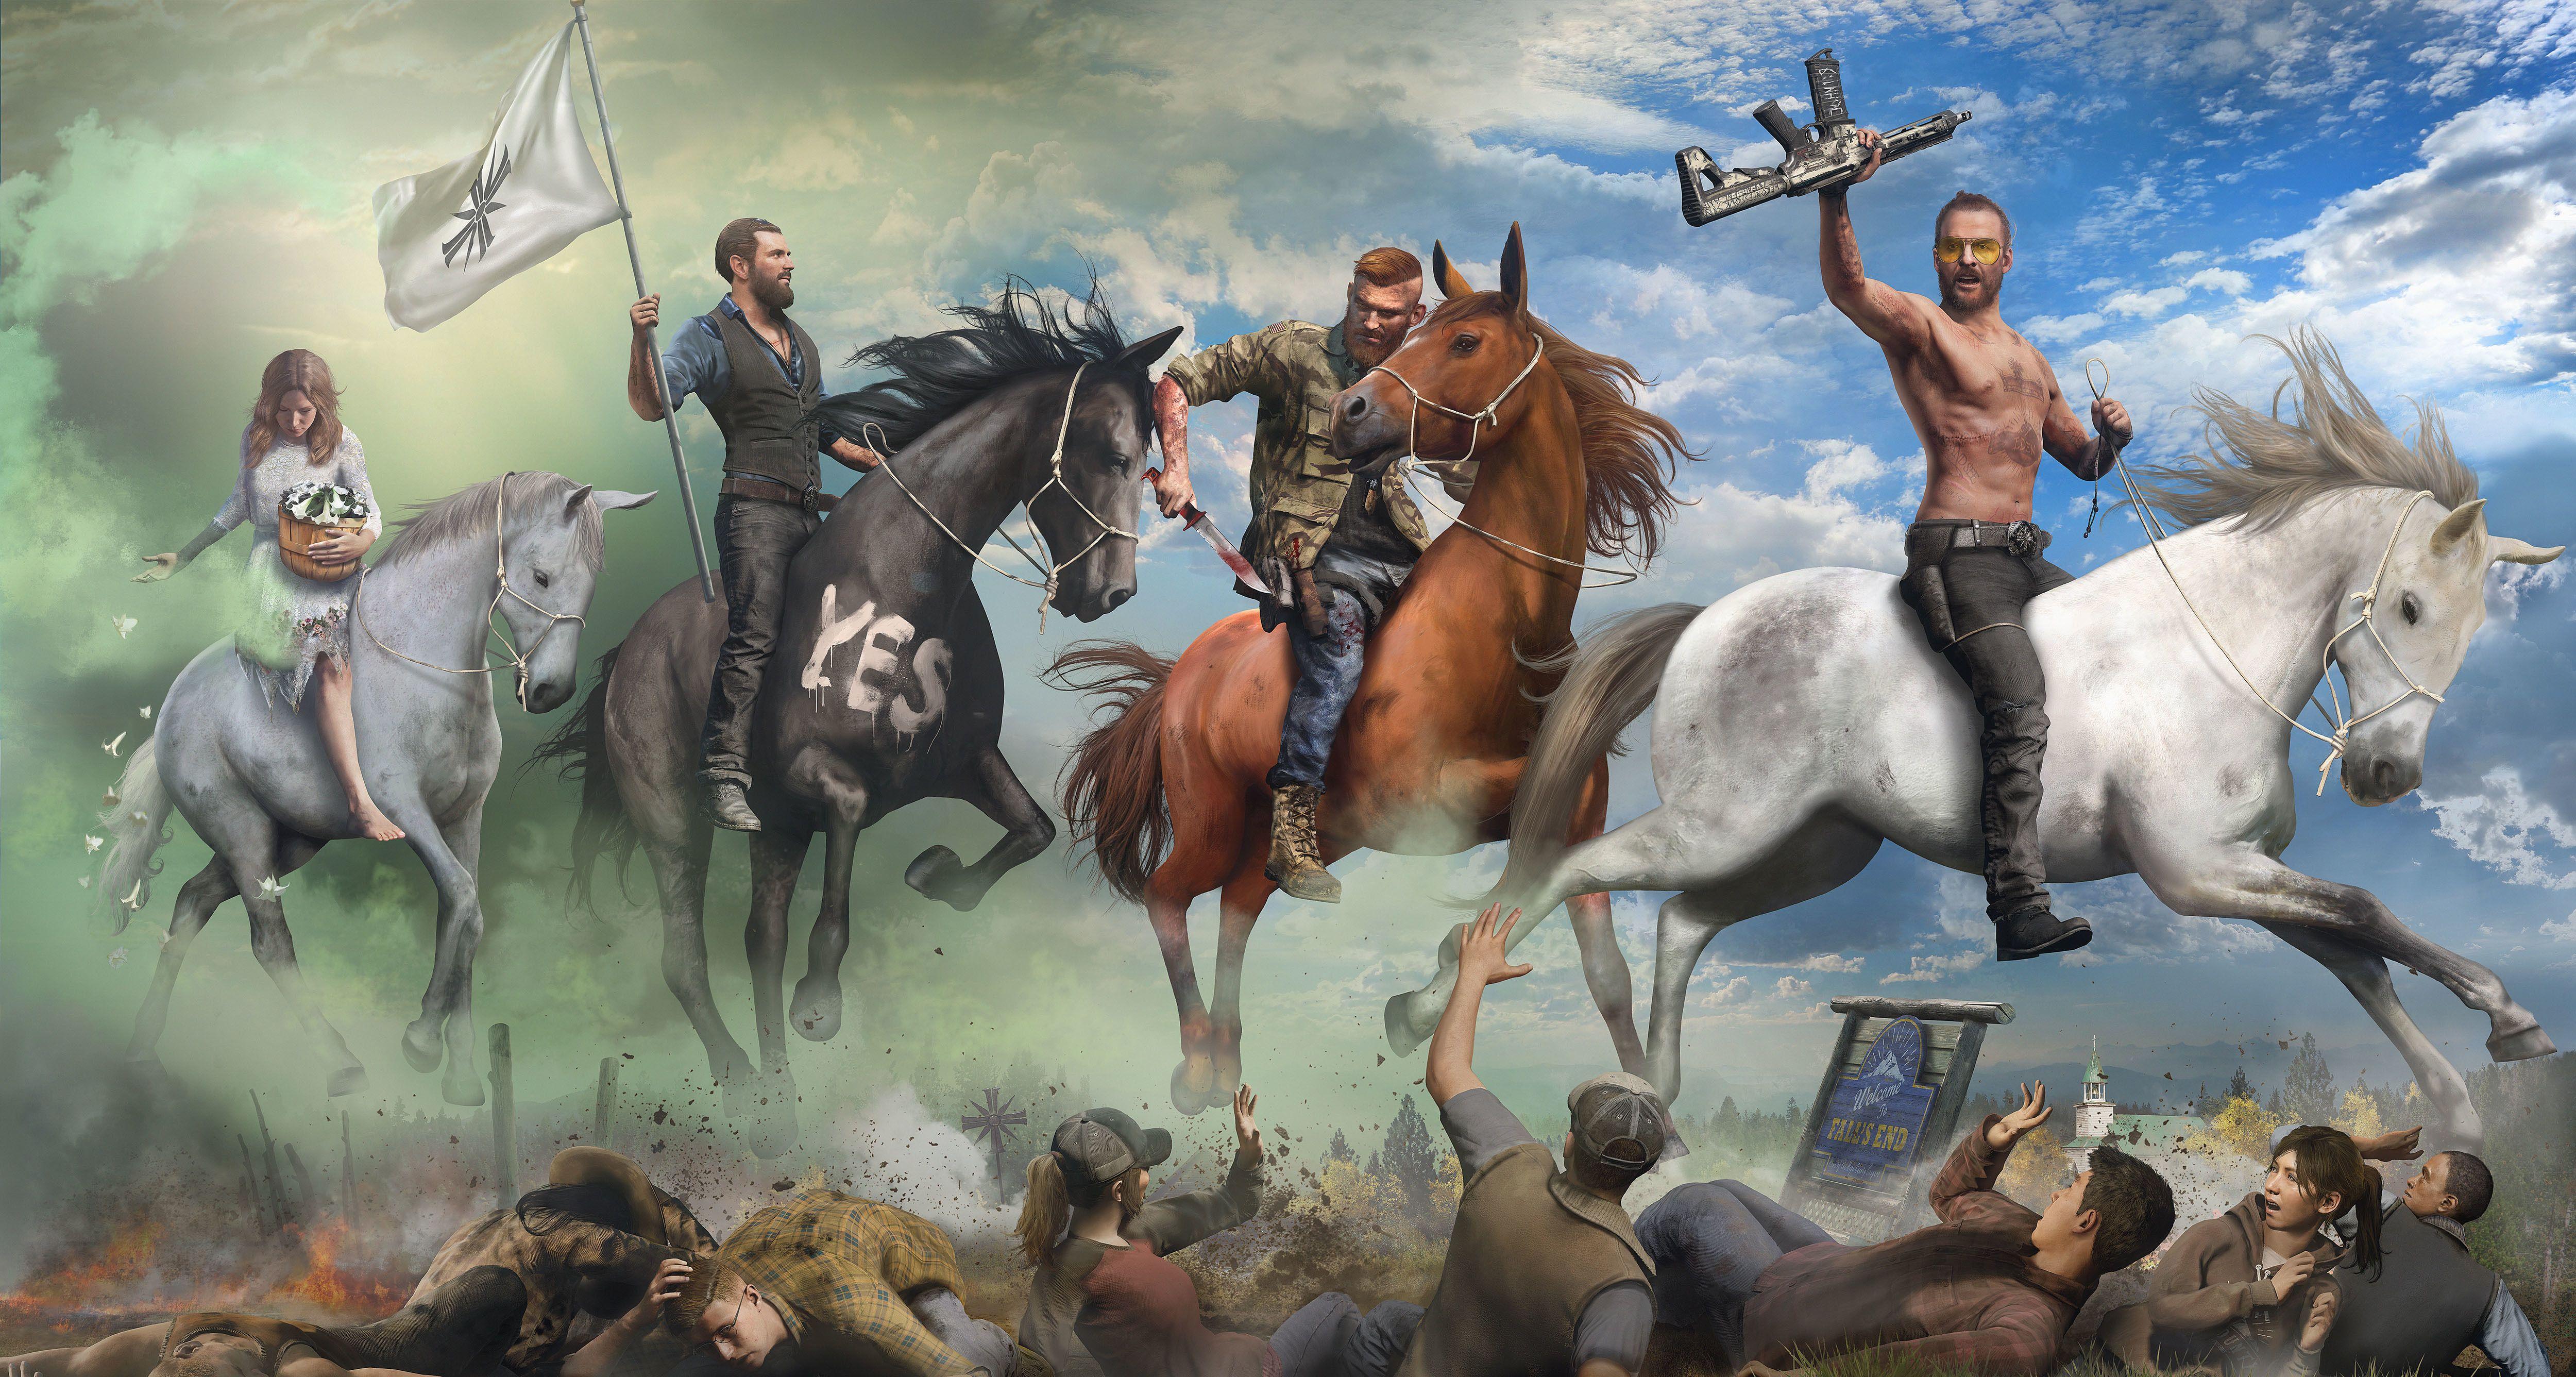 Far Cry 5 Four Horsemen Art Horsemen Of The Apocalypse Far Cry 5 Crying